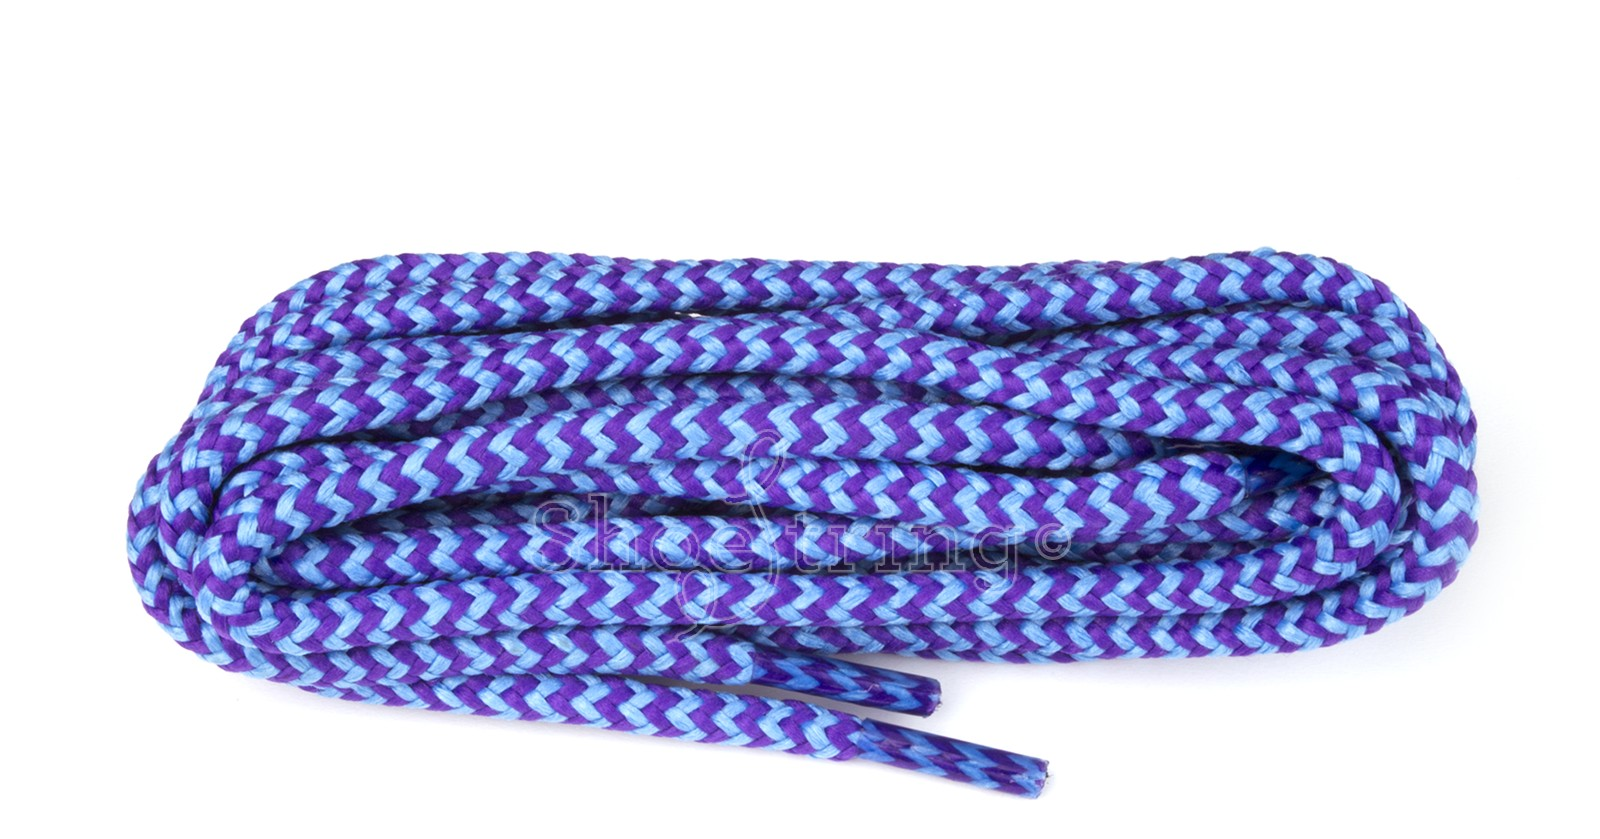 Hiking 150cm Aqua/purple Dog-tooth